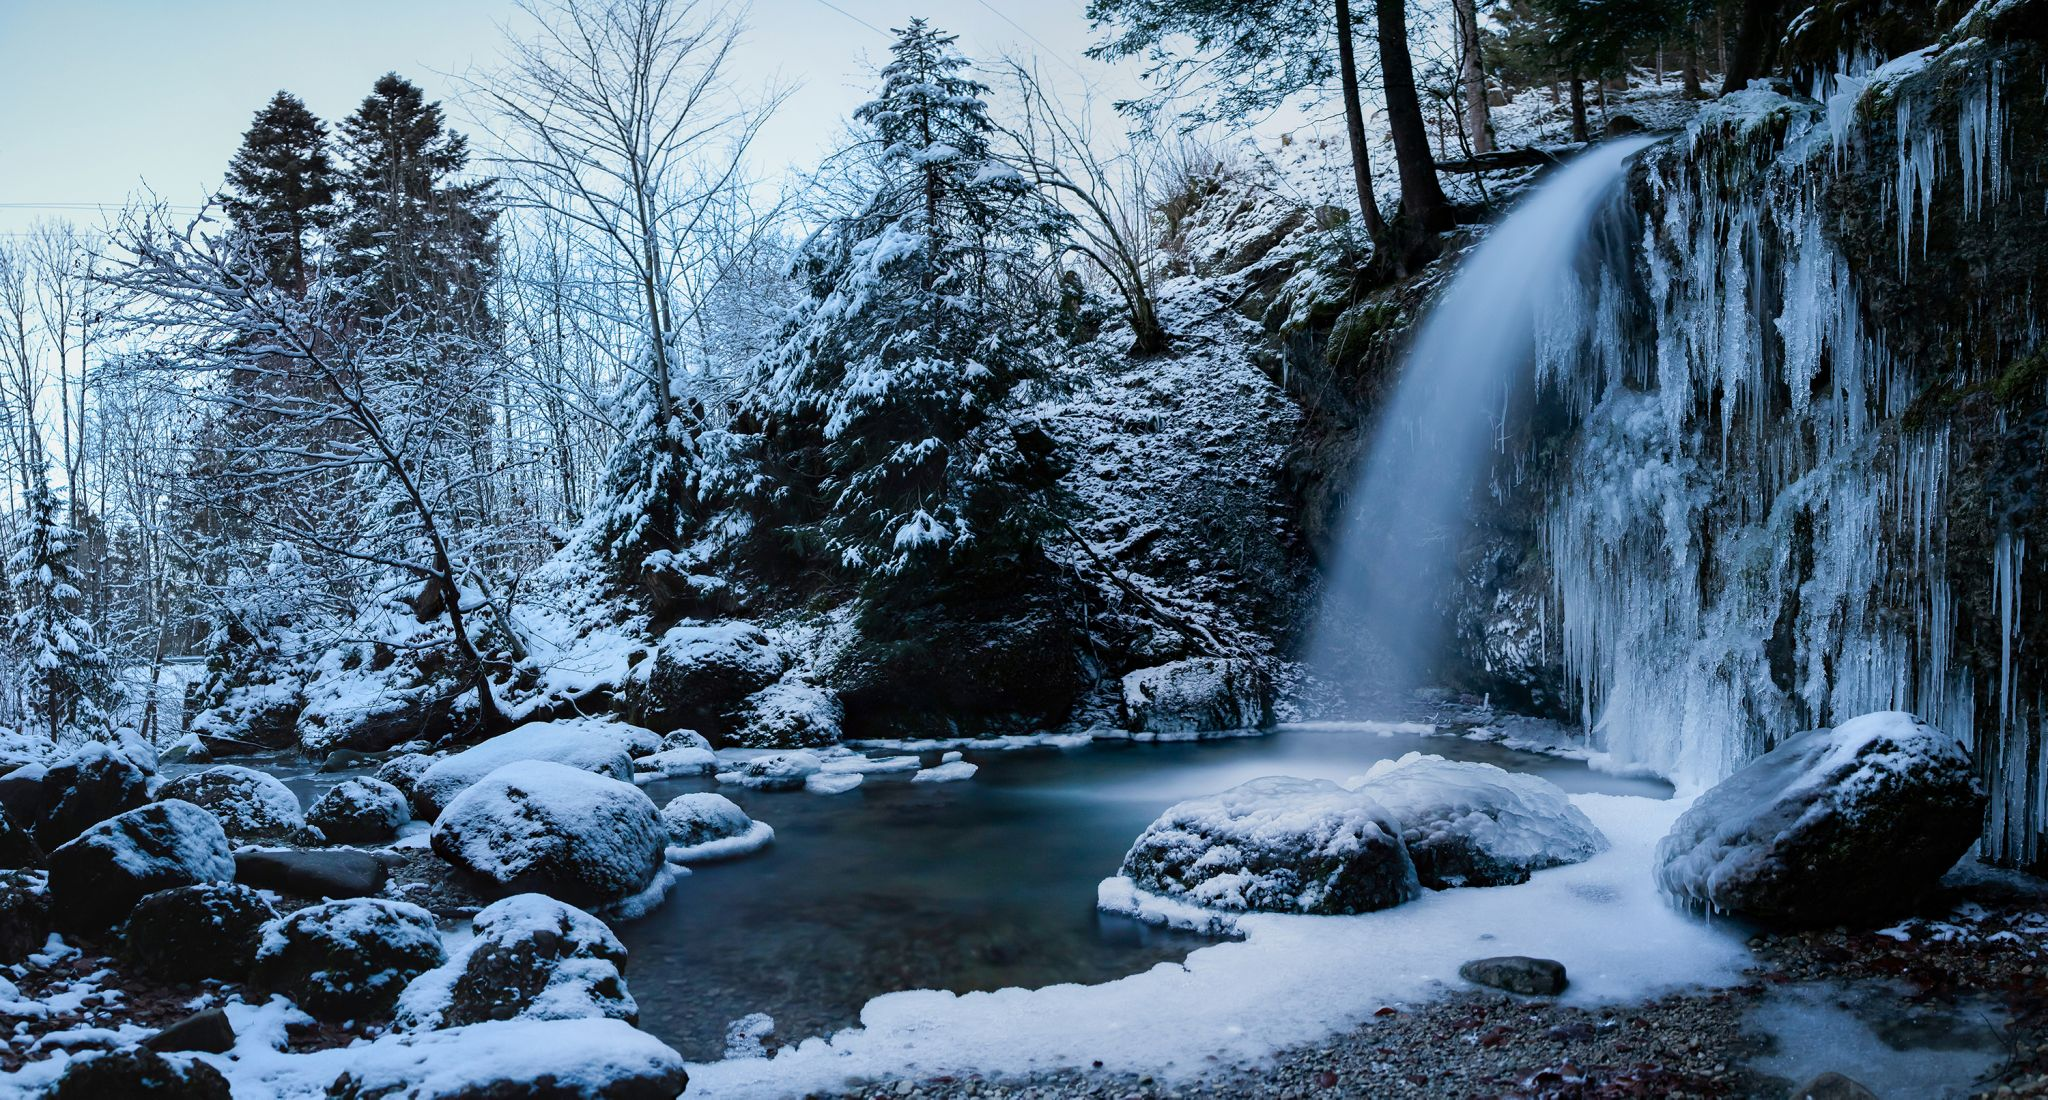 Upper Gschwender Waterfall, Germany